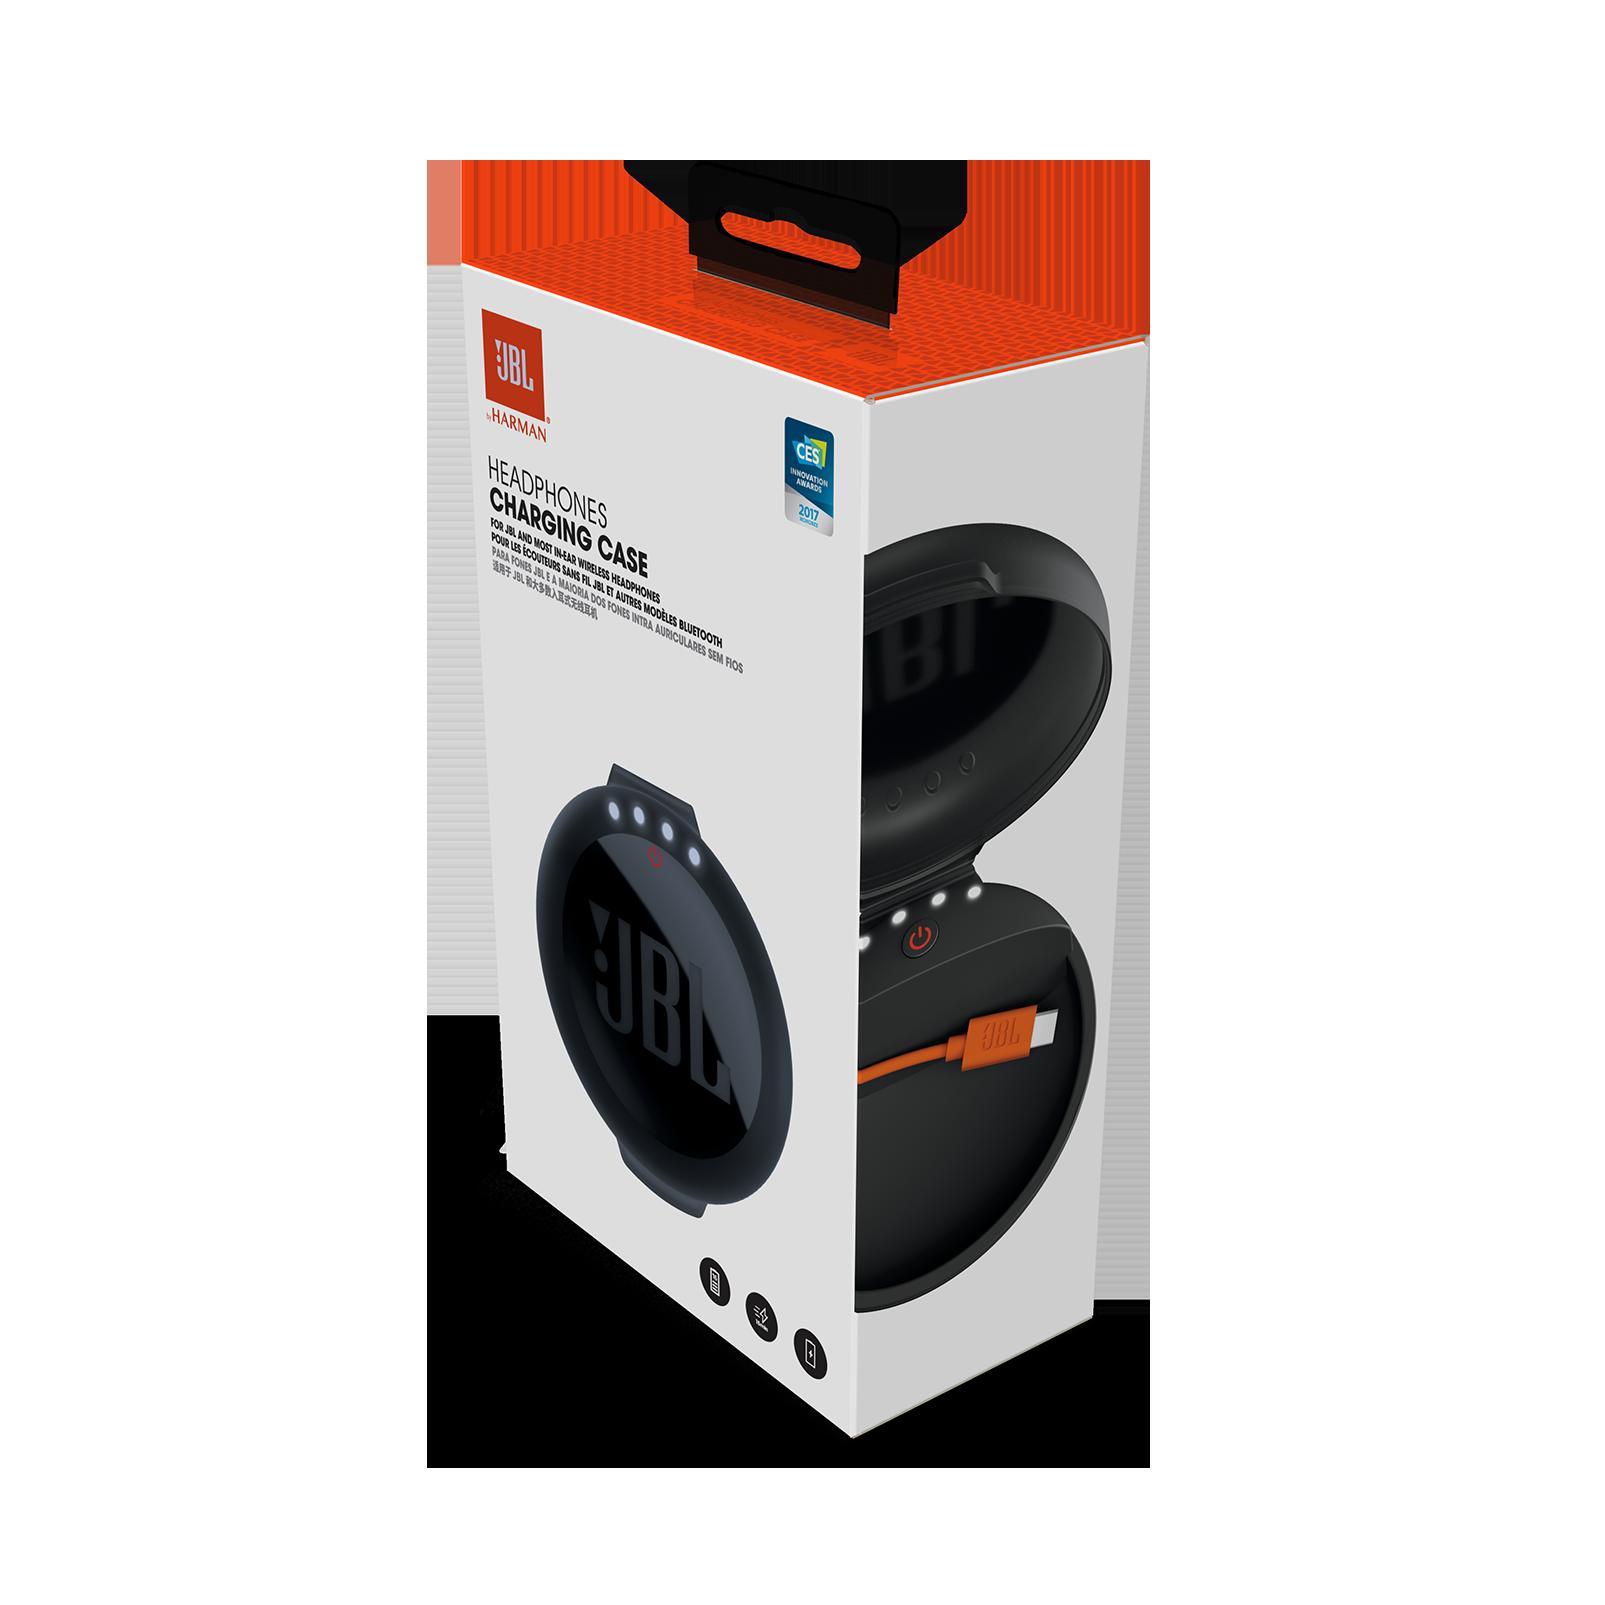 Jbl Headphones Charging Case Headset Wireless Stereo S990 New Design Manuals Downloads